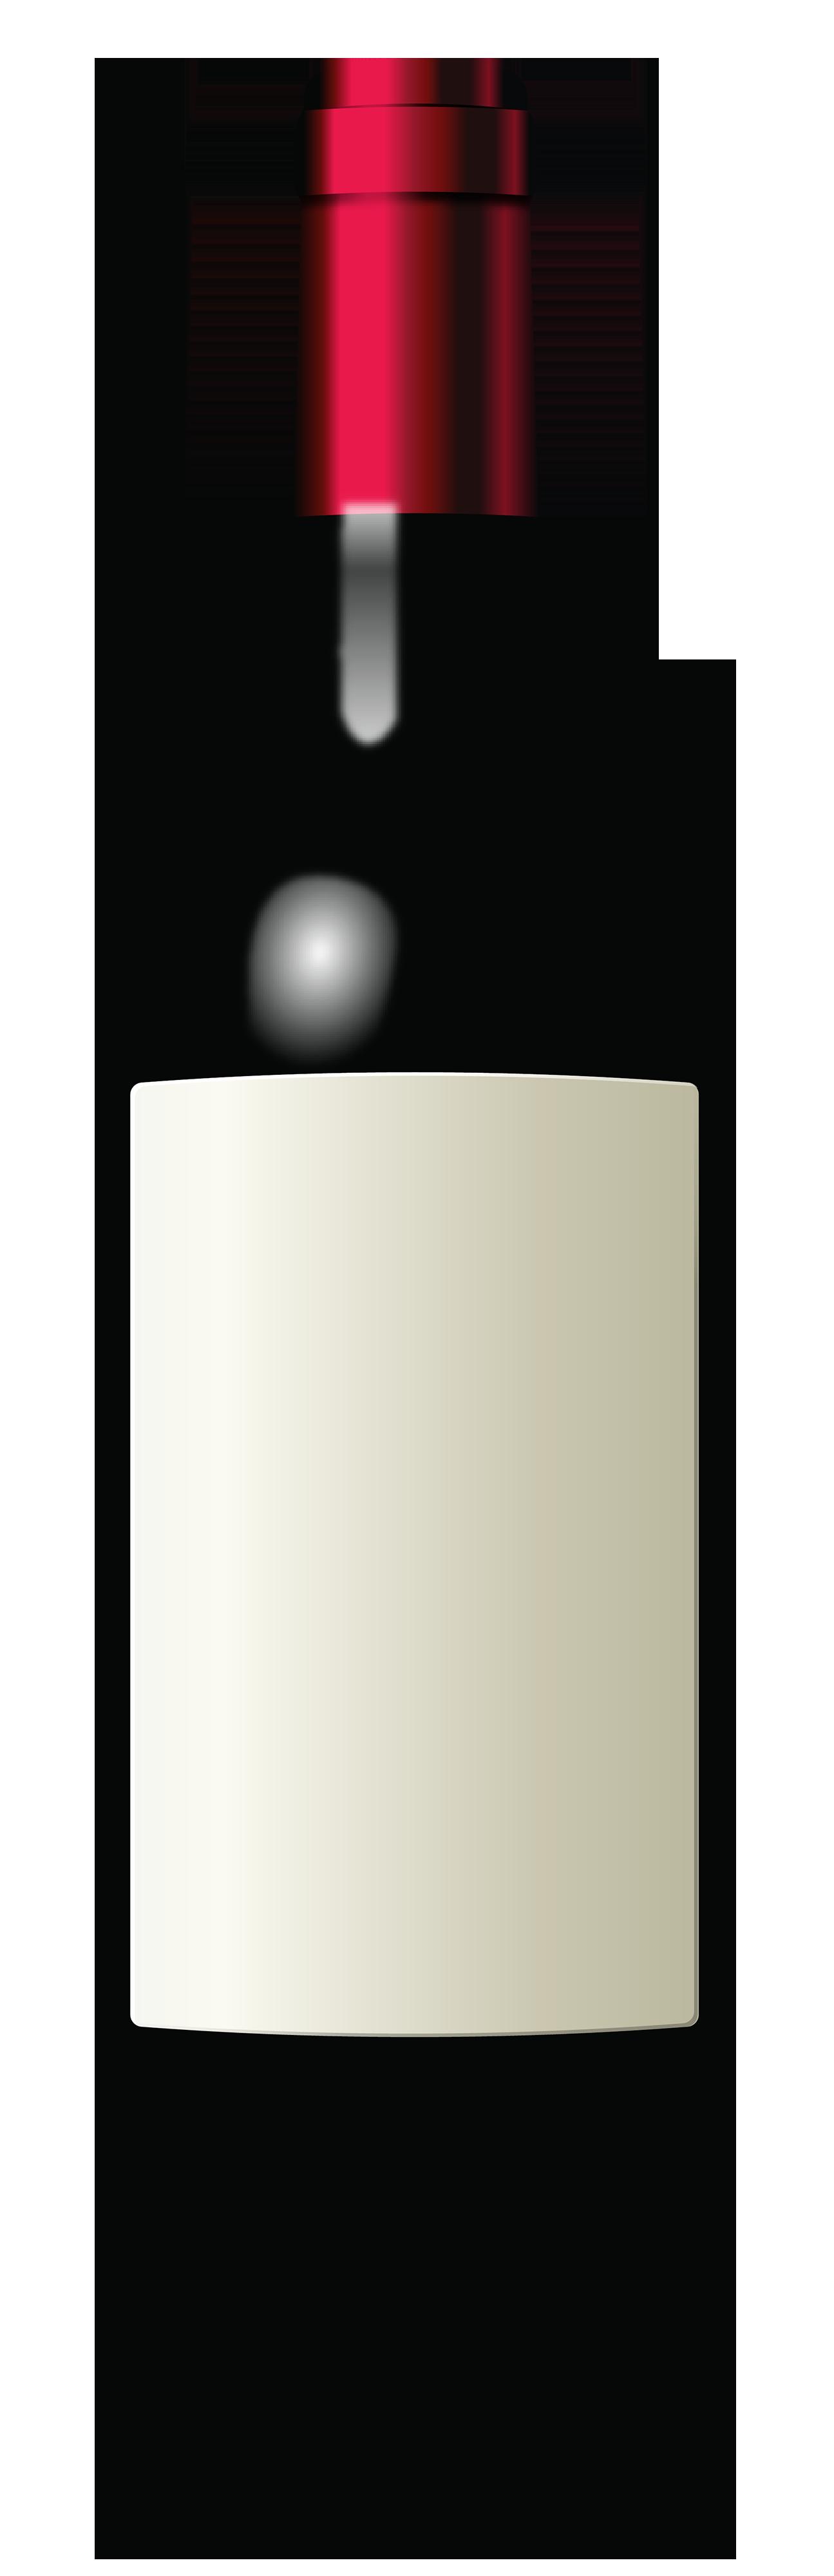 1295x4000 Wine Bottle Clipart